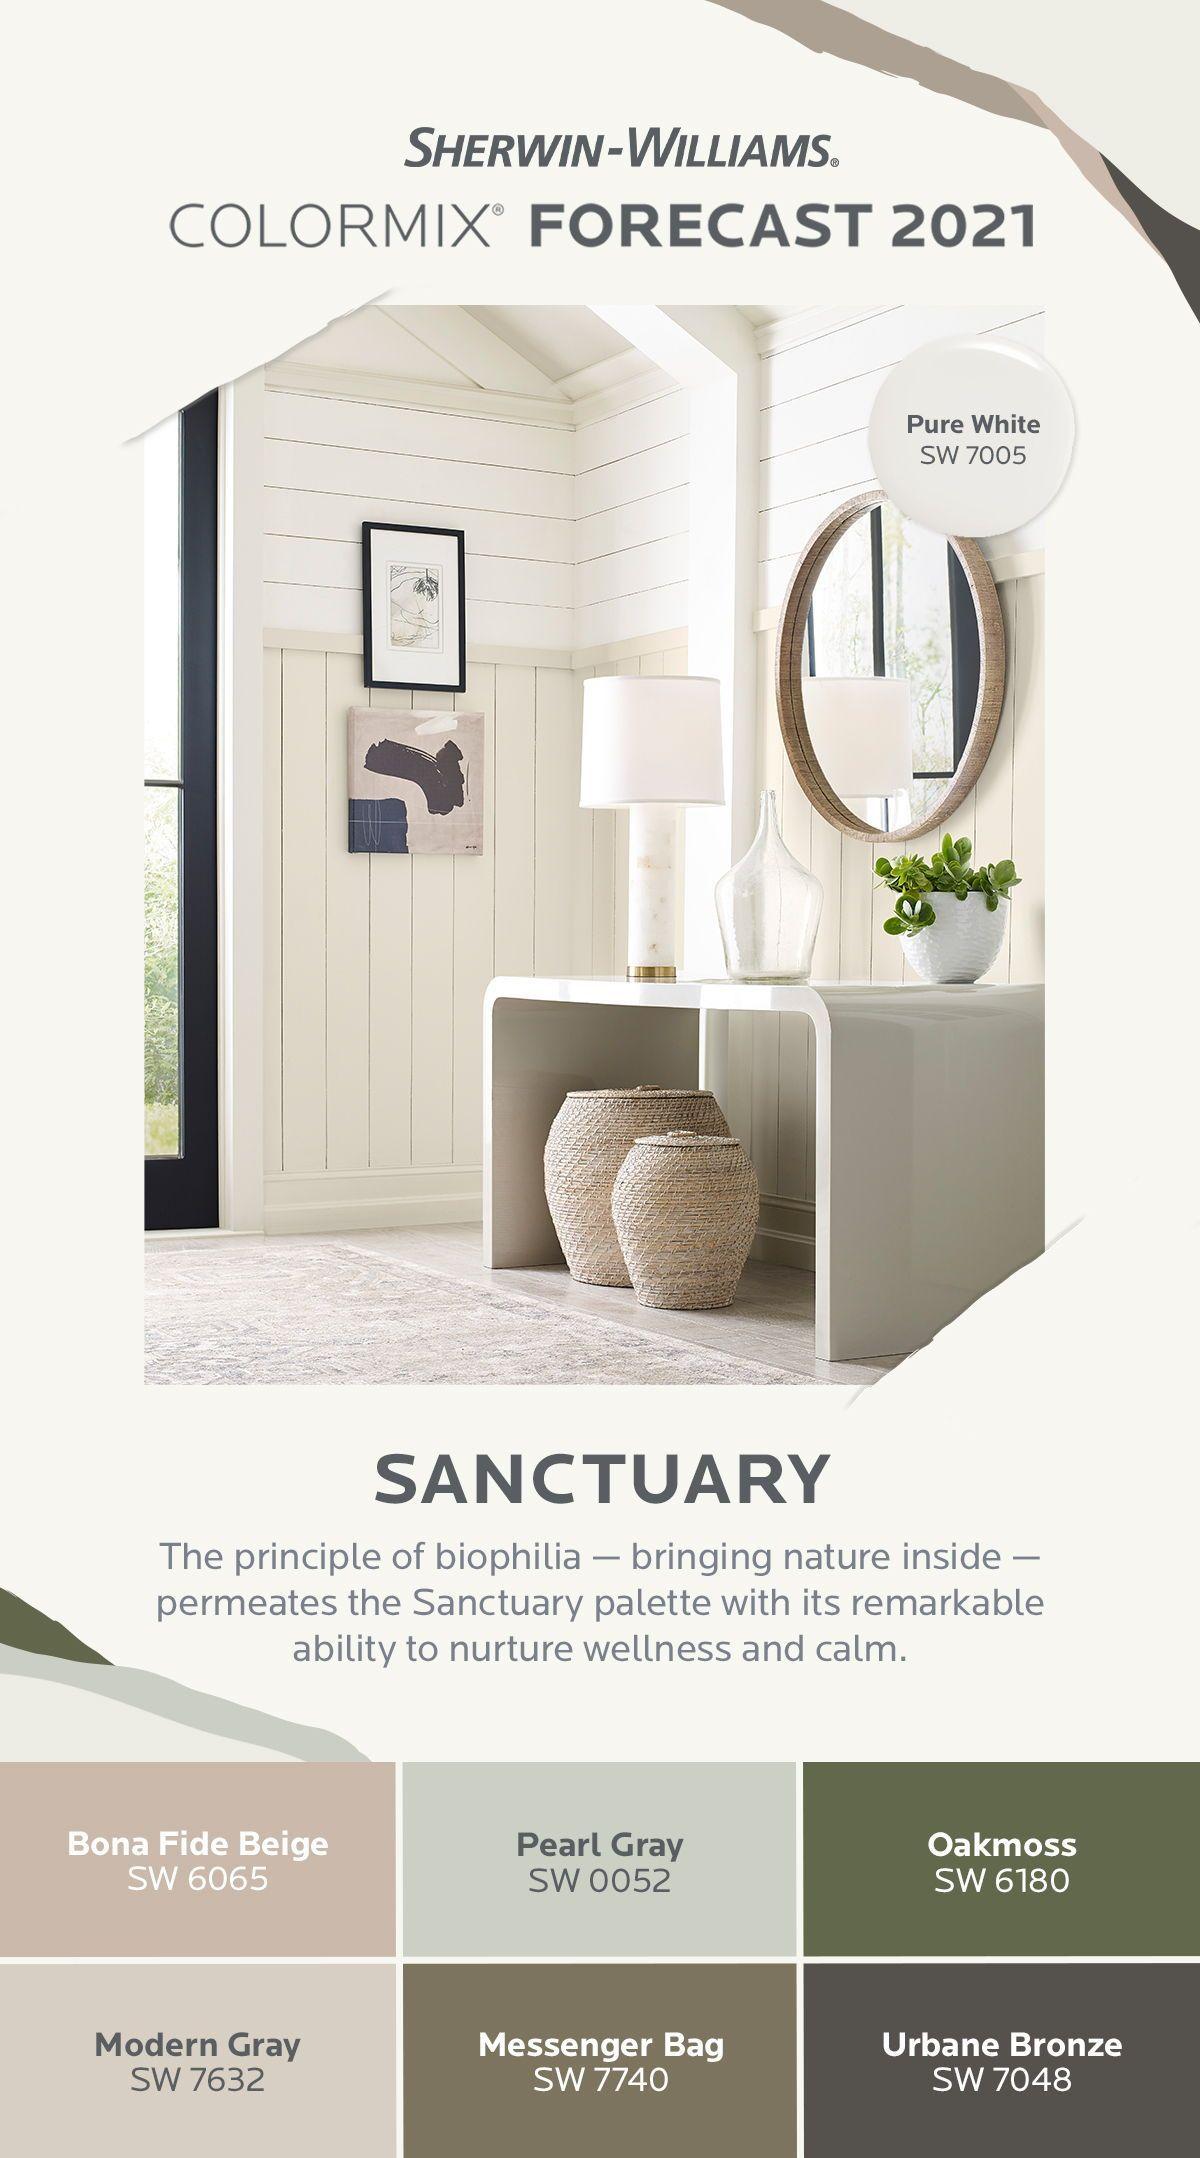 Sherwin Williams 2021 Colormix® Forecast Sanctuary Palette   Paint colors for living room ...